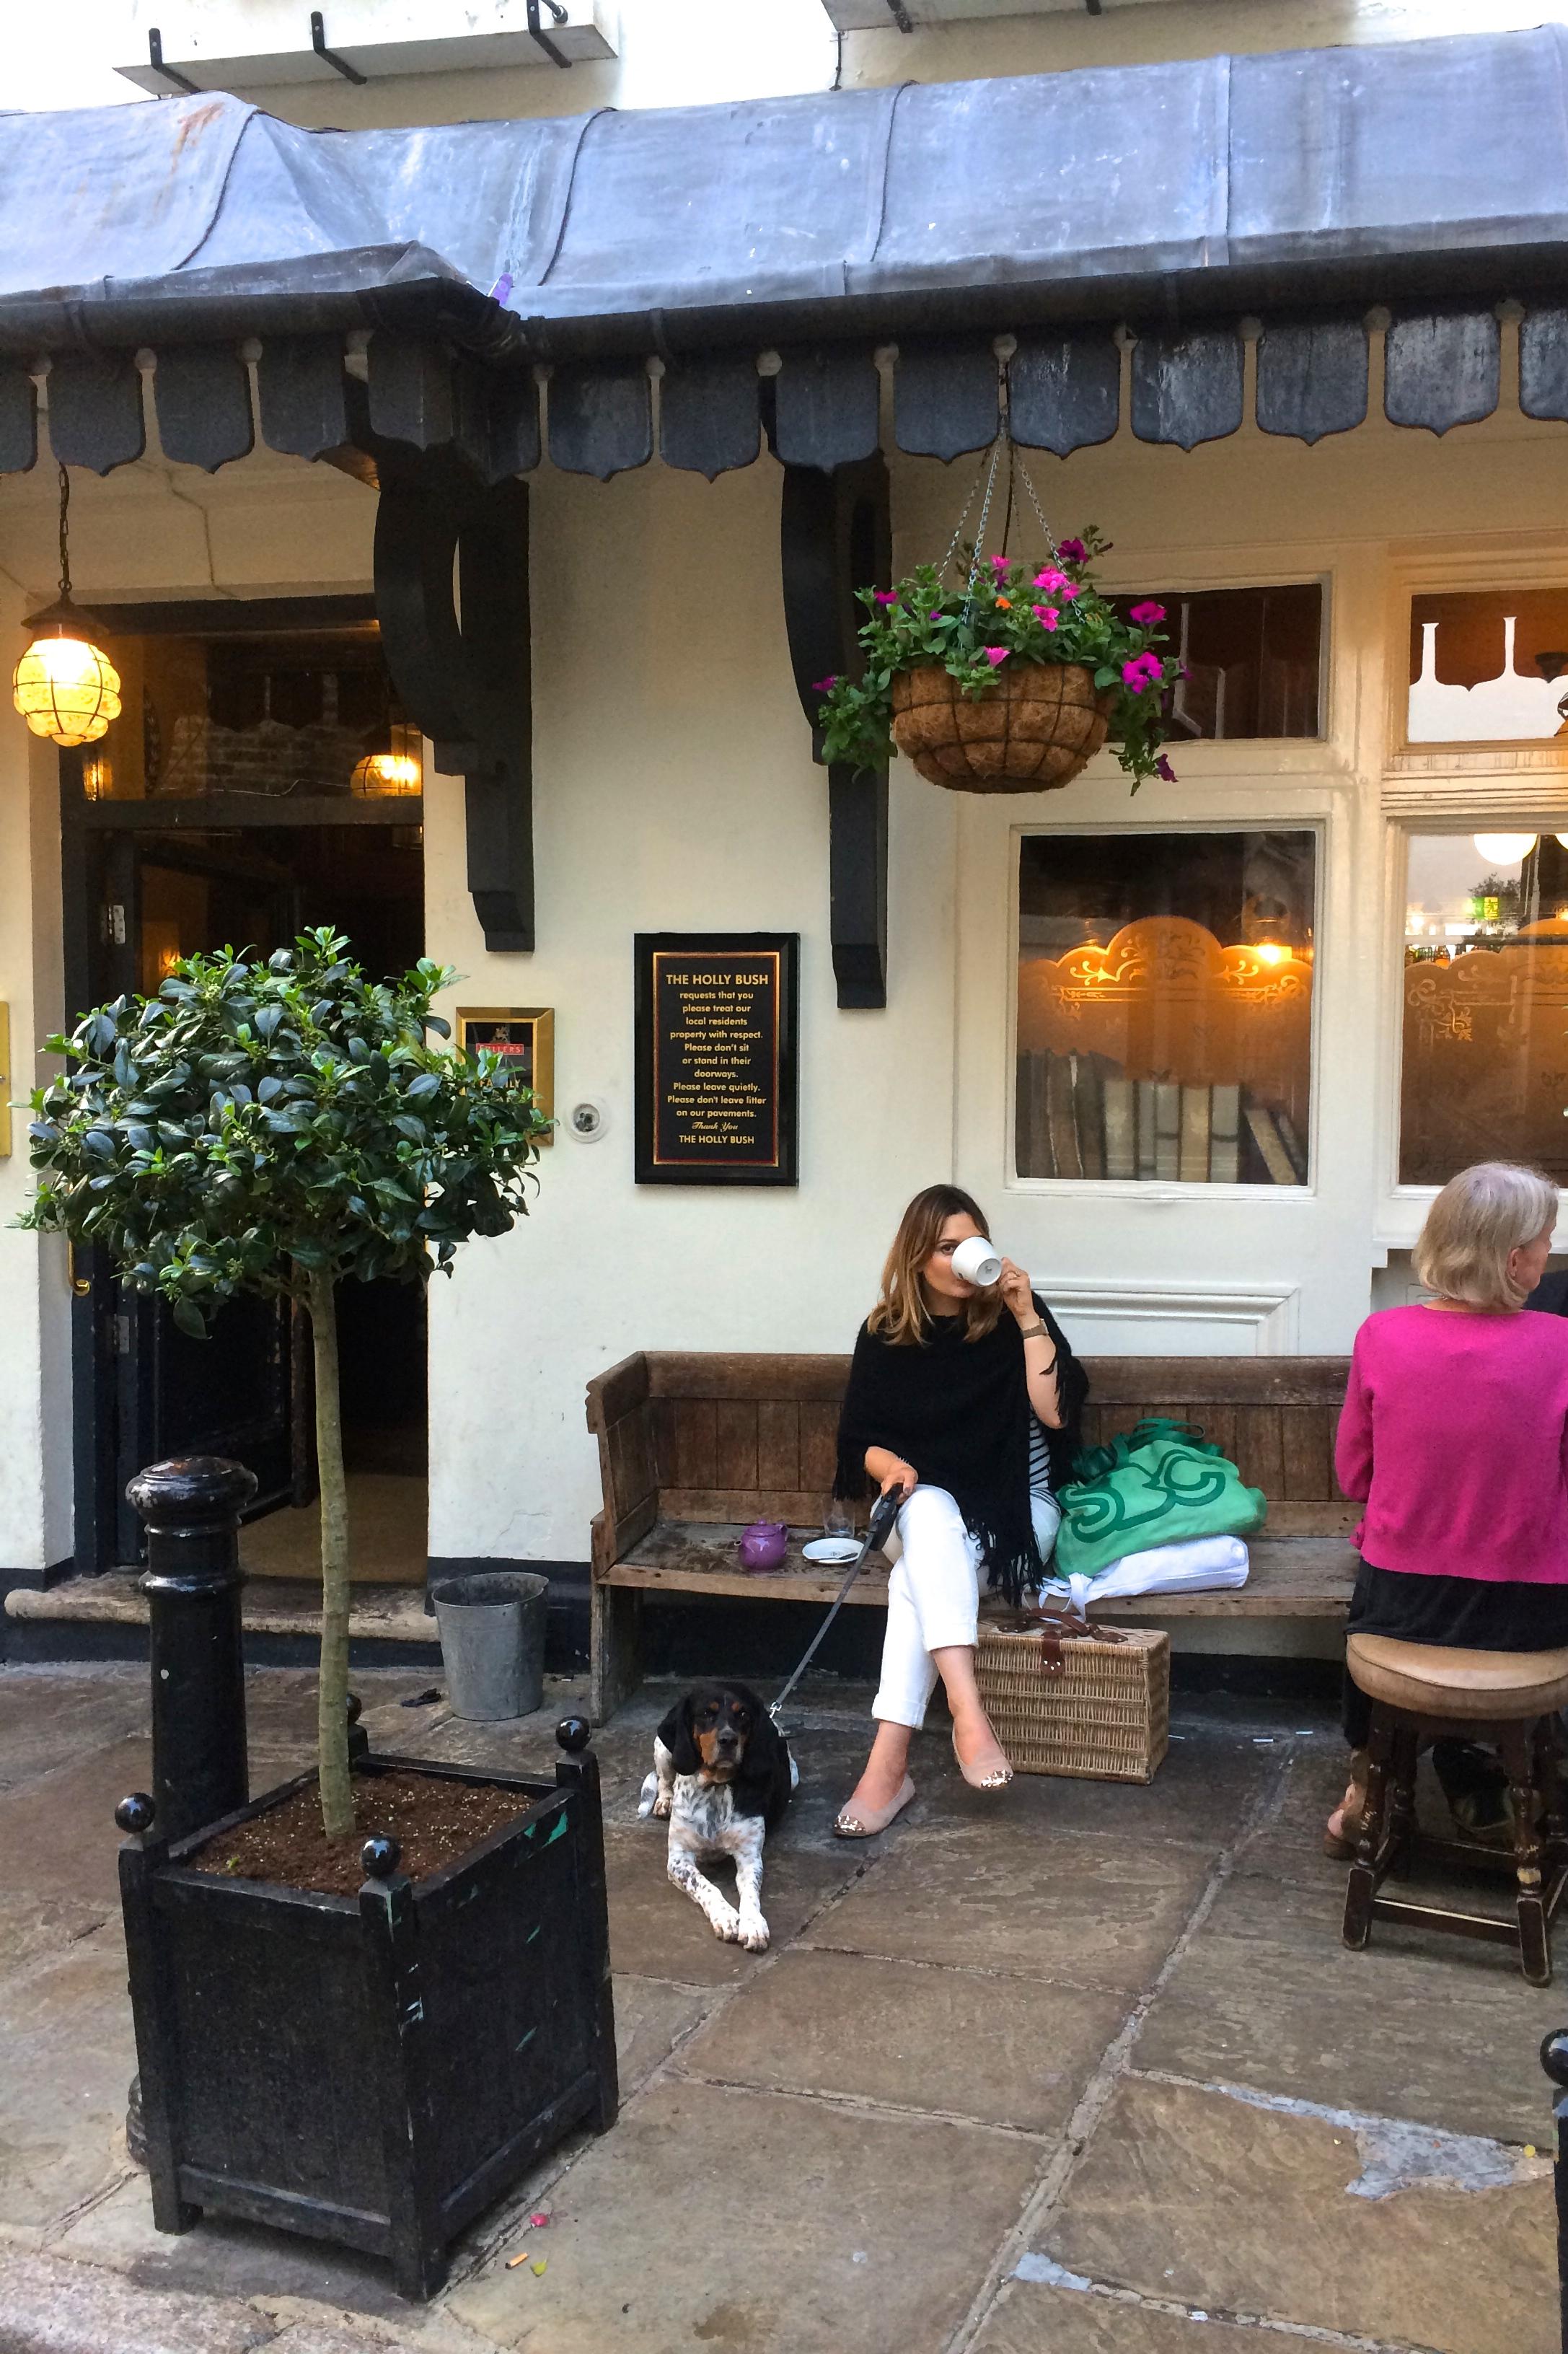 The Hollybush Hampstead